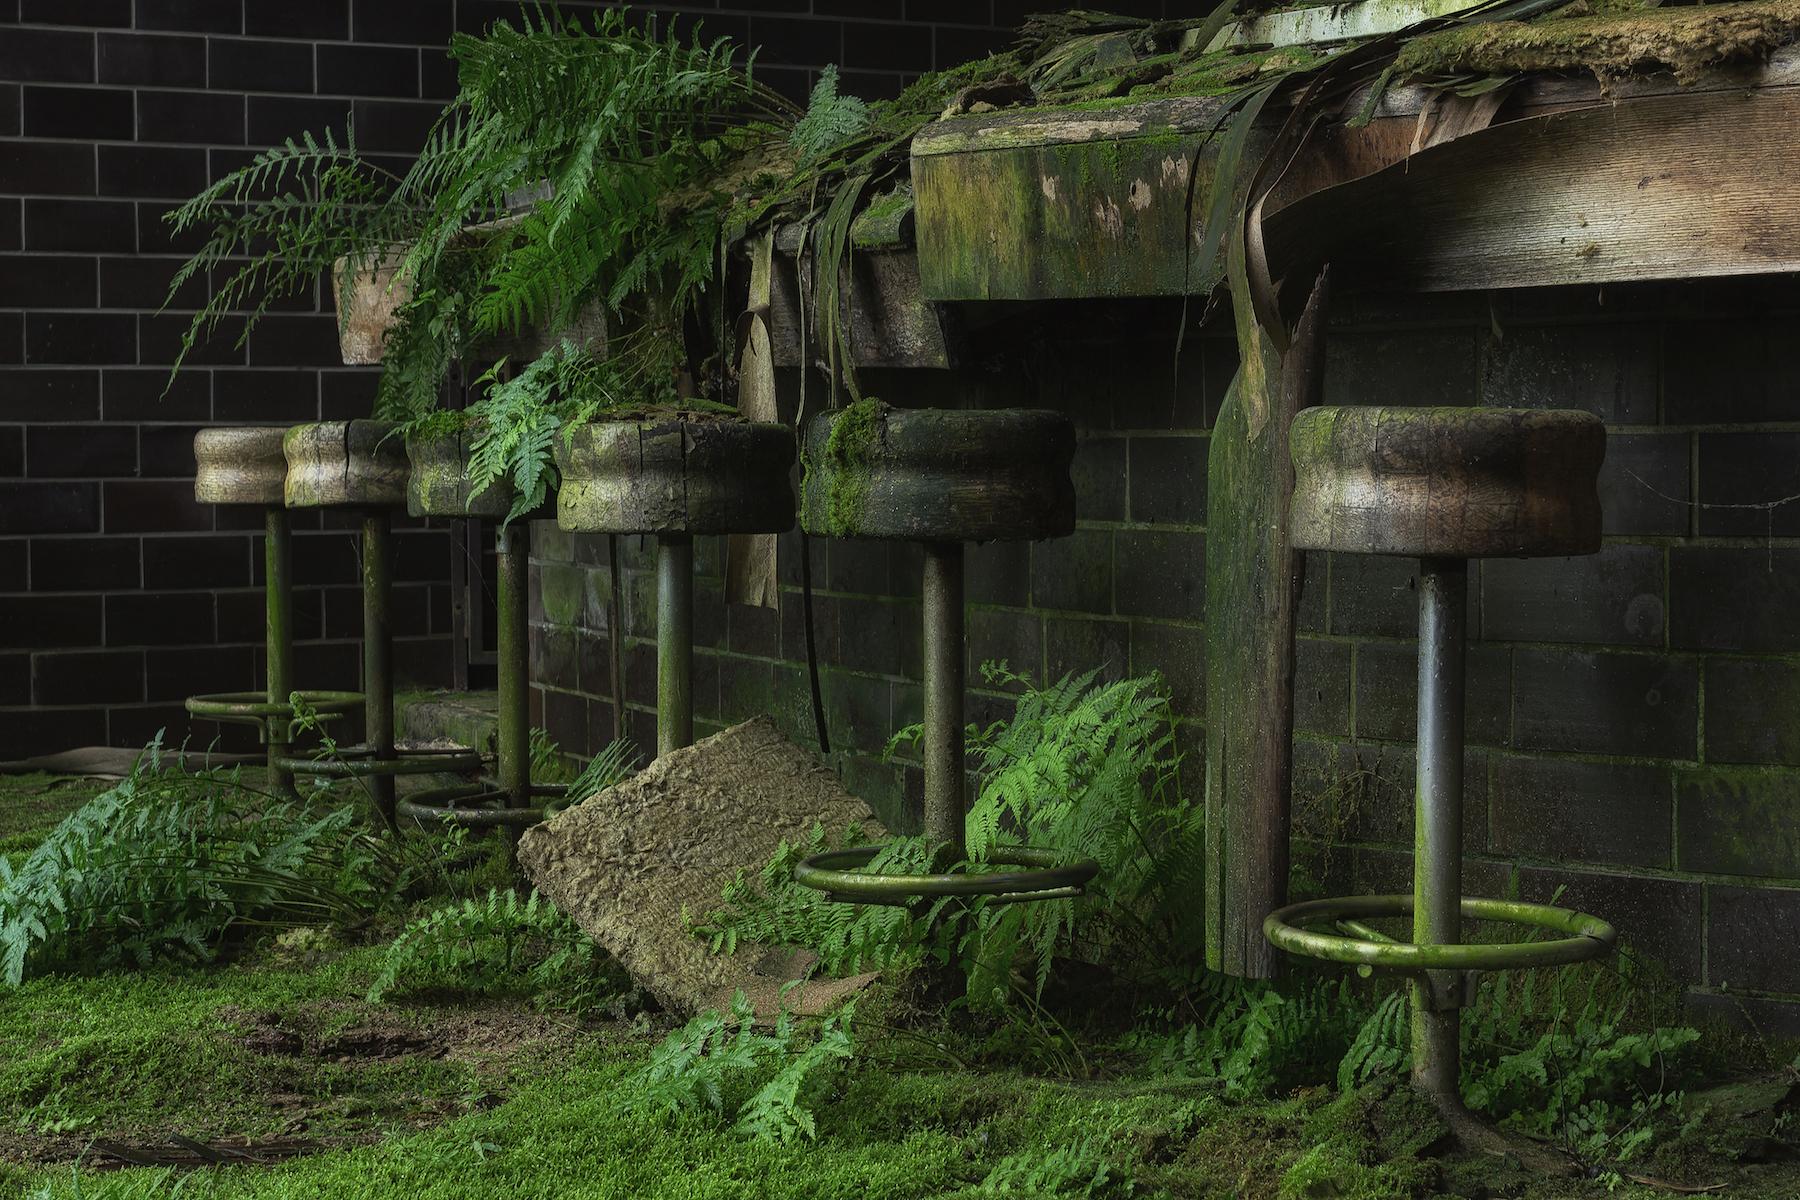 Taburetes de bar entre plantas en lugares abandonados por Stefan Baumann